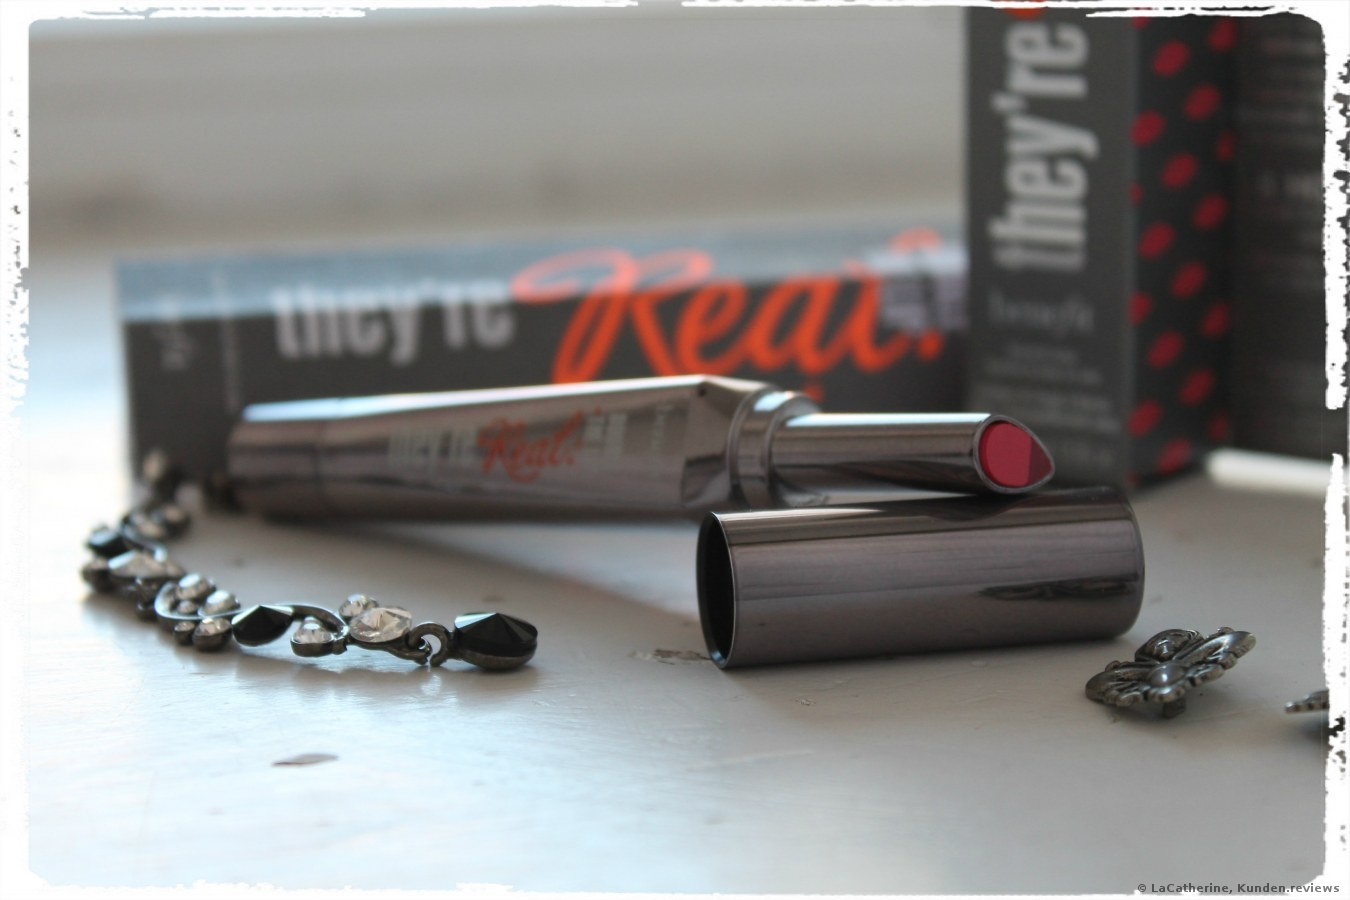 They're Real Lipstick - Double the Lip Lippenstift von Benefit